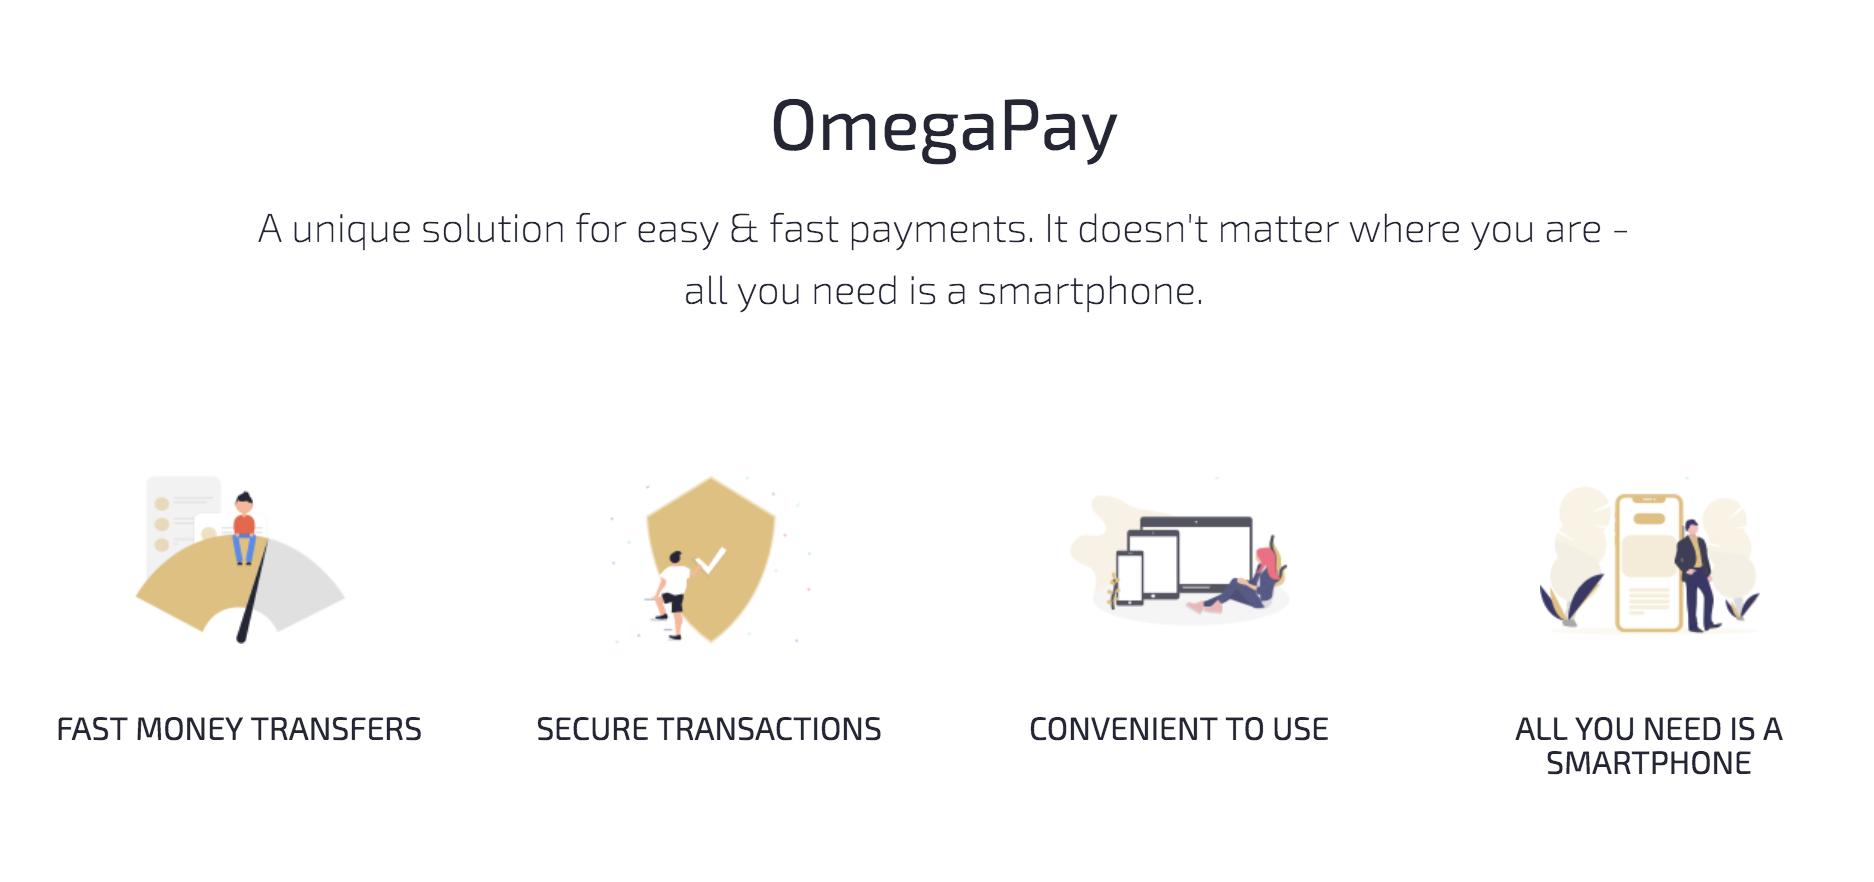 OMEGA(オメガ)Pay